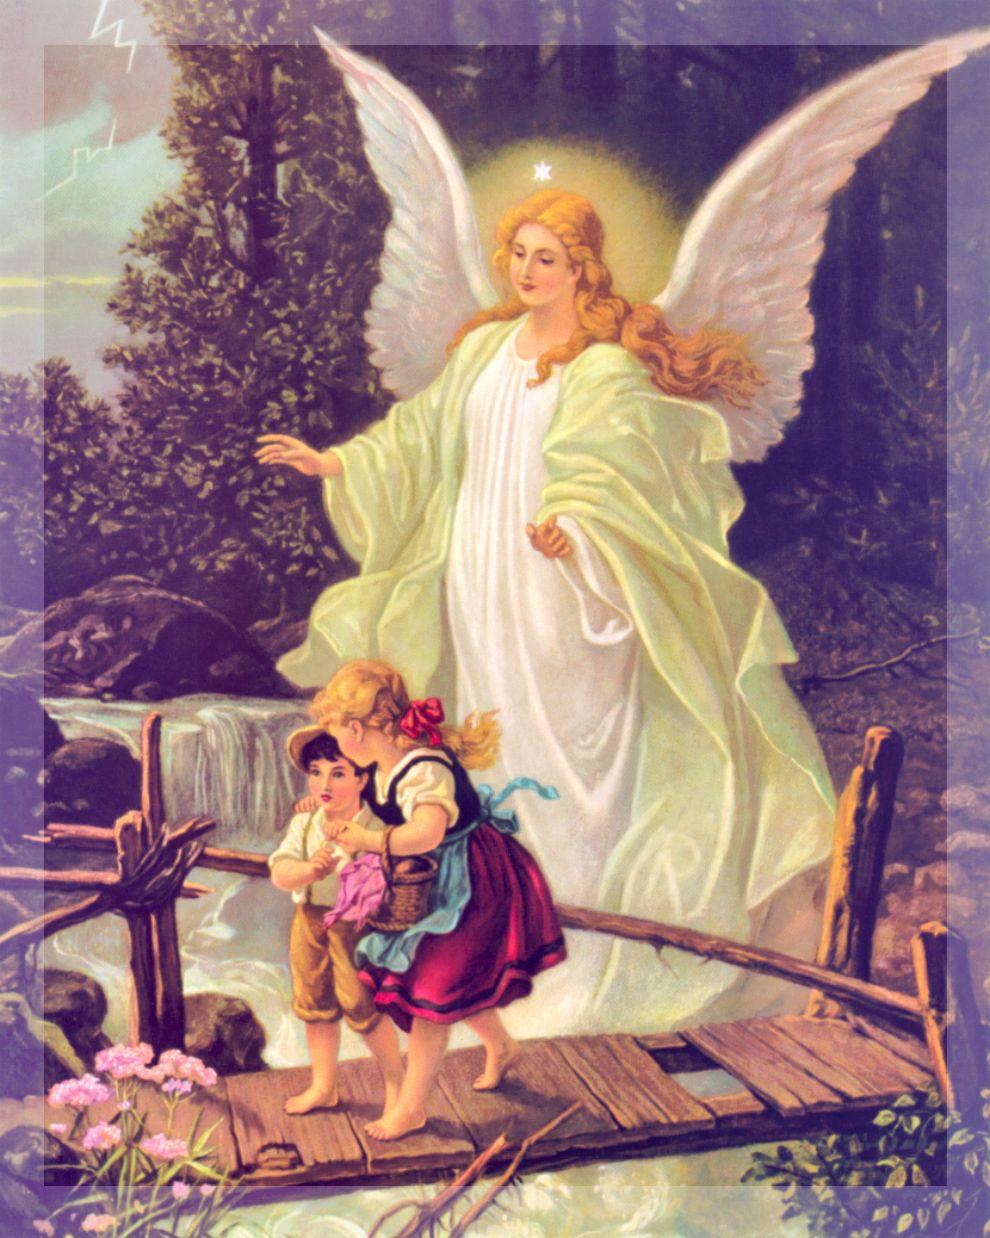 Pin De Fernanda Batista Em Anjos Arte De Anjo Pinturas De Anjo